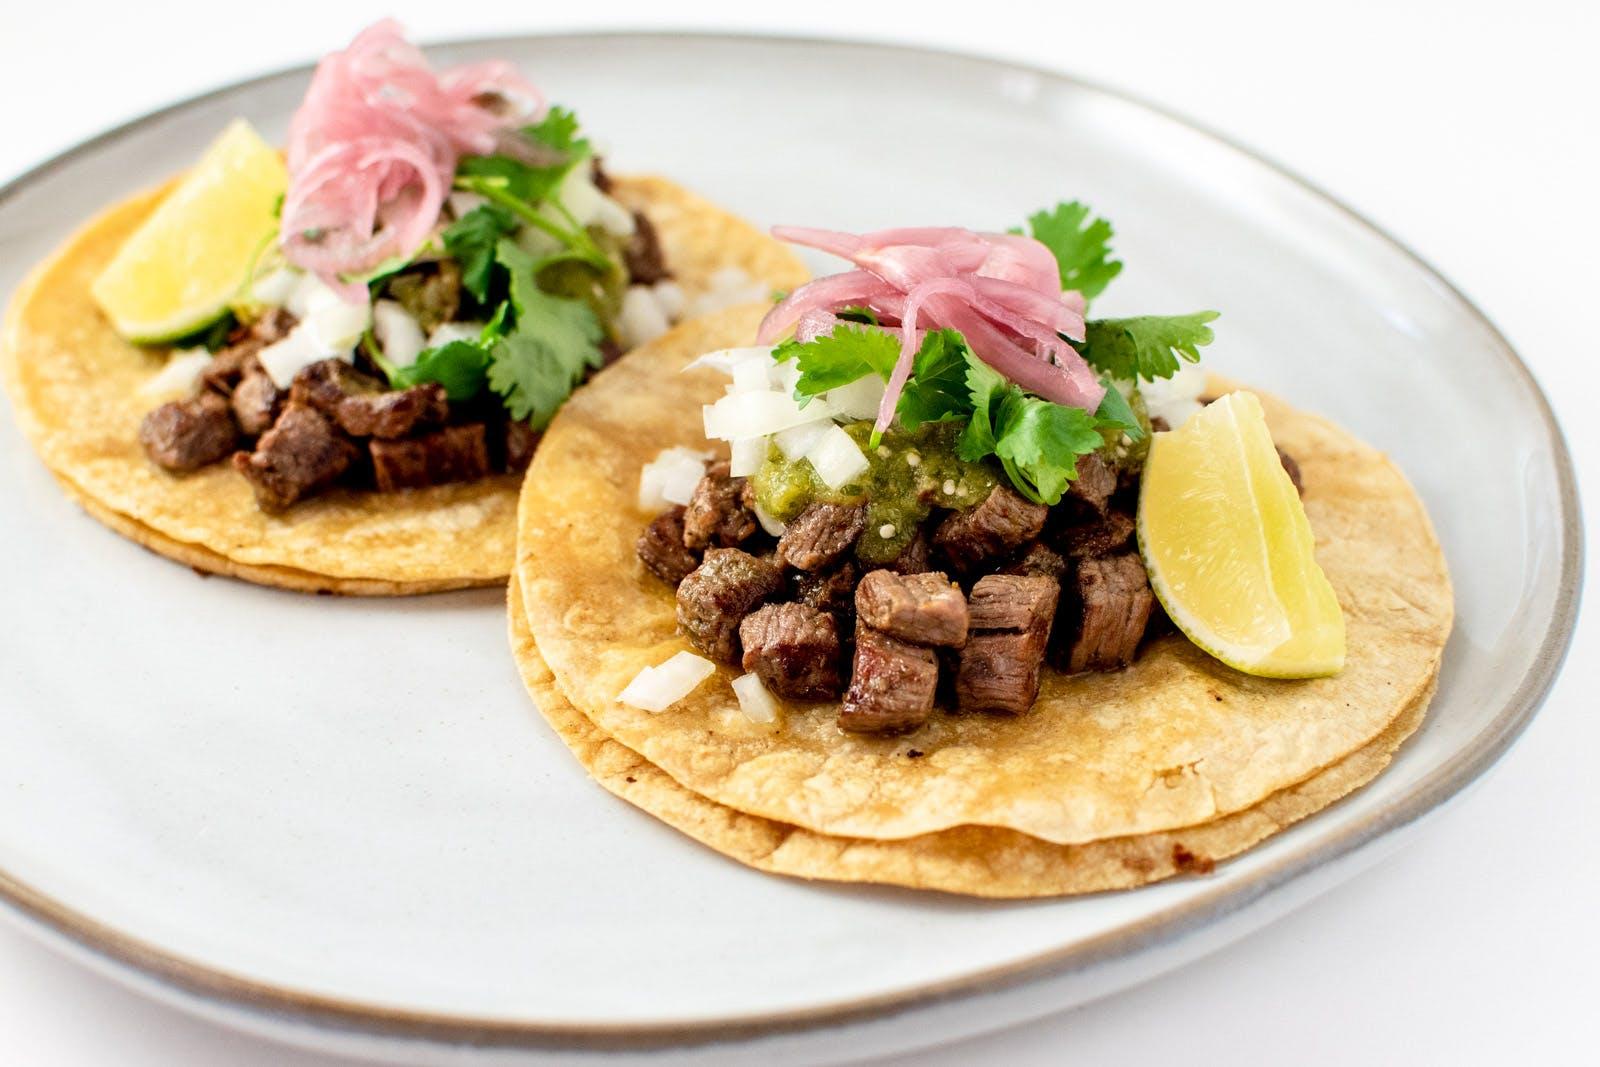 Carne Asada Tacos from Taco Royale - Eastside Madison in Madison, WI